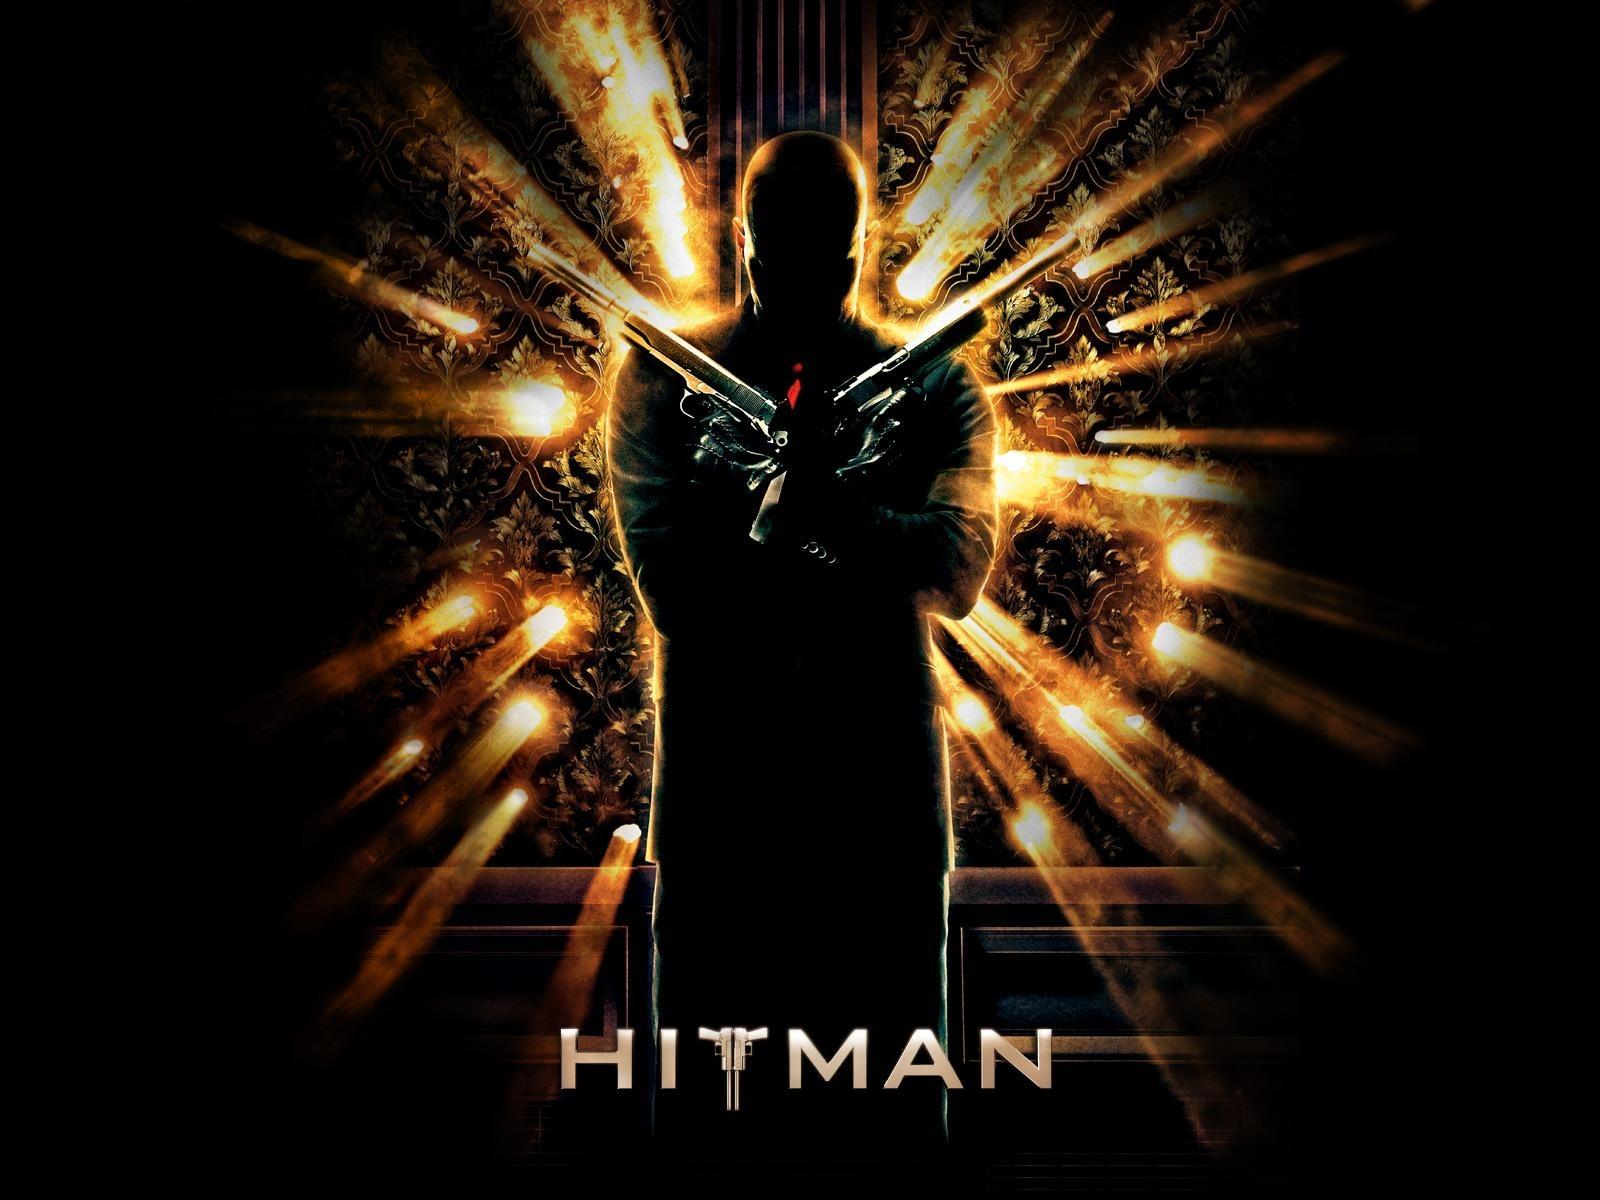 Hitman Movie Wallpaper Hitman Movies Wallpapers In Jpg Format For